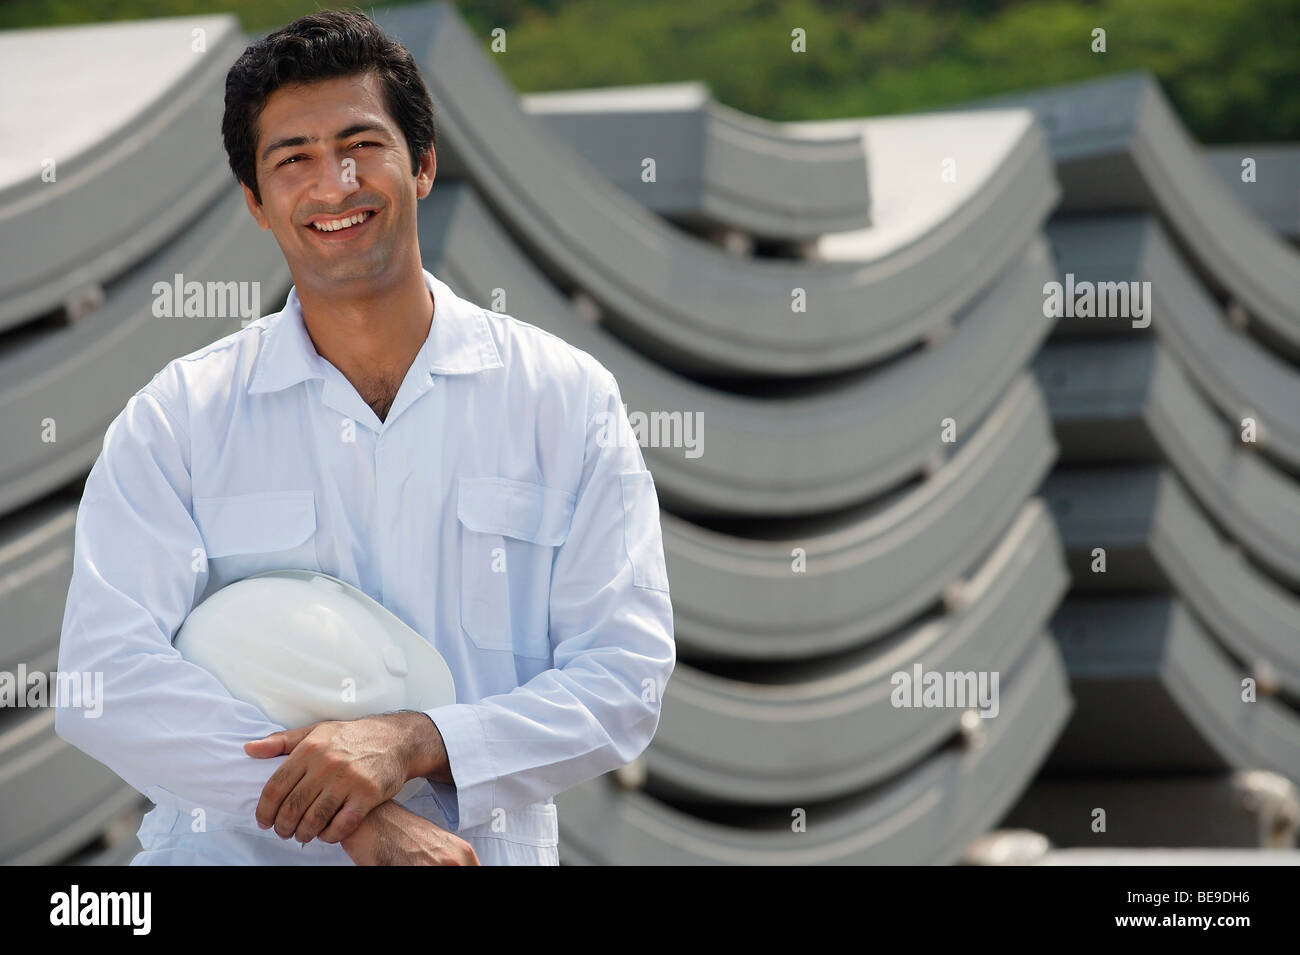 Man in work uniform, smiling at camera - Stock Image